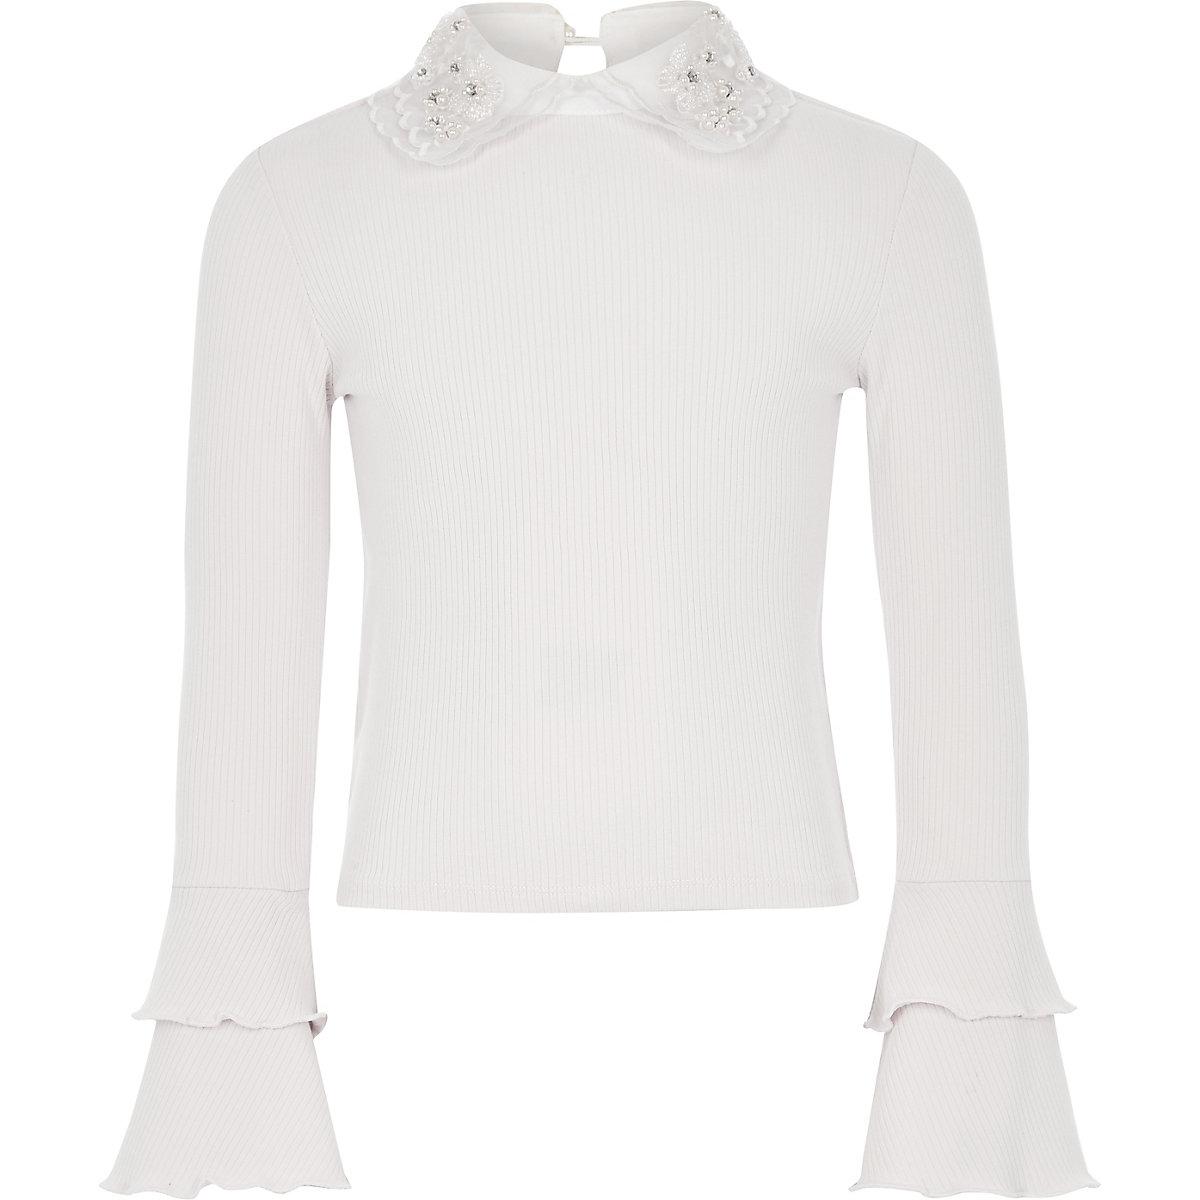 Girls cream embellished collar frill top